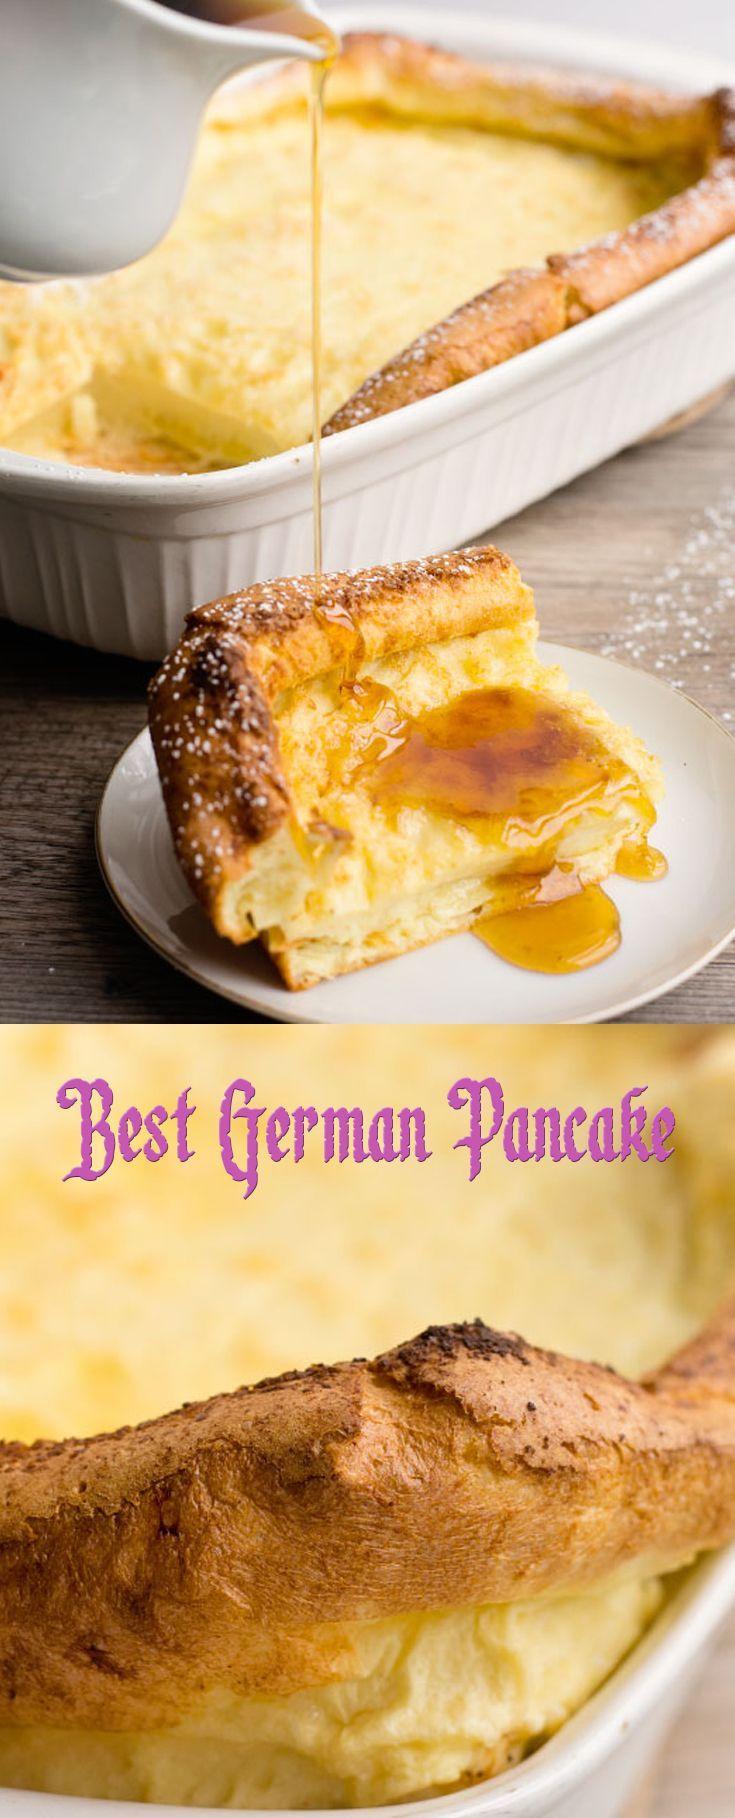 Best 25 Dutch Colonial Exterior Ideas On Pinterest: 25+ Best Ideas About German Pancakes On Pinterest